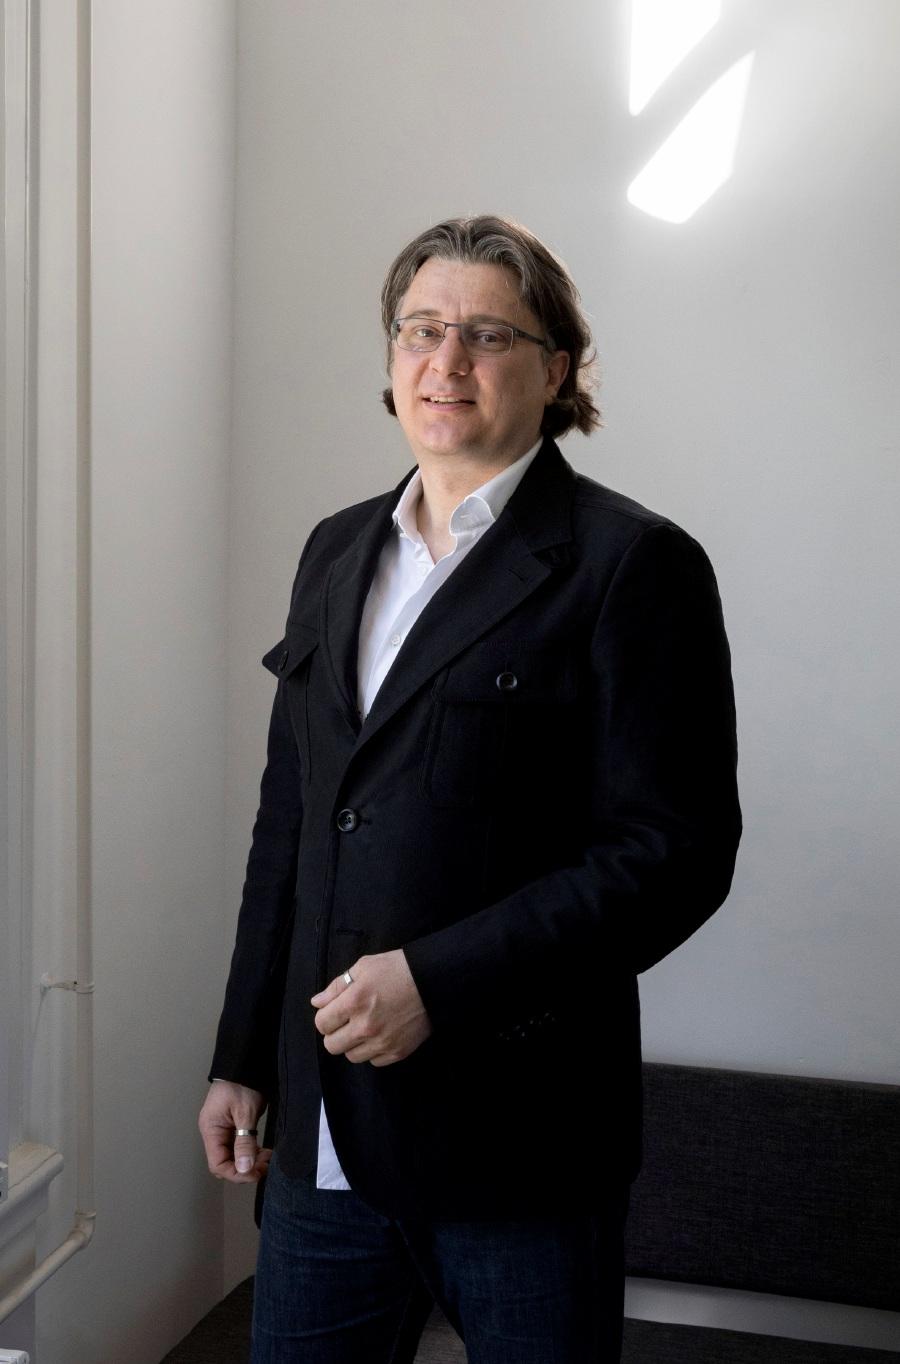 Hannes Pfau, partner at UNStudio. Photo courtesy of UNStudio